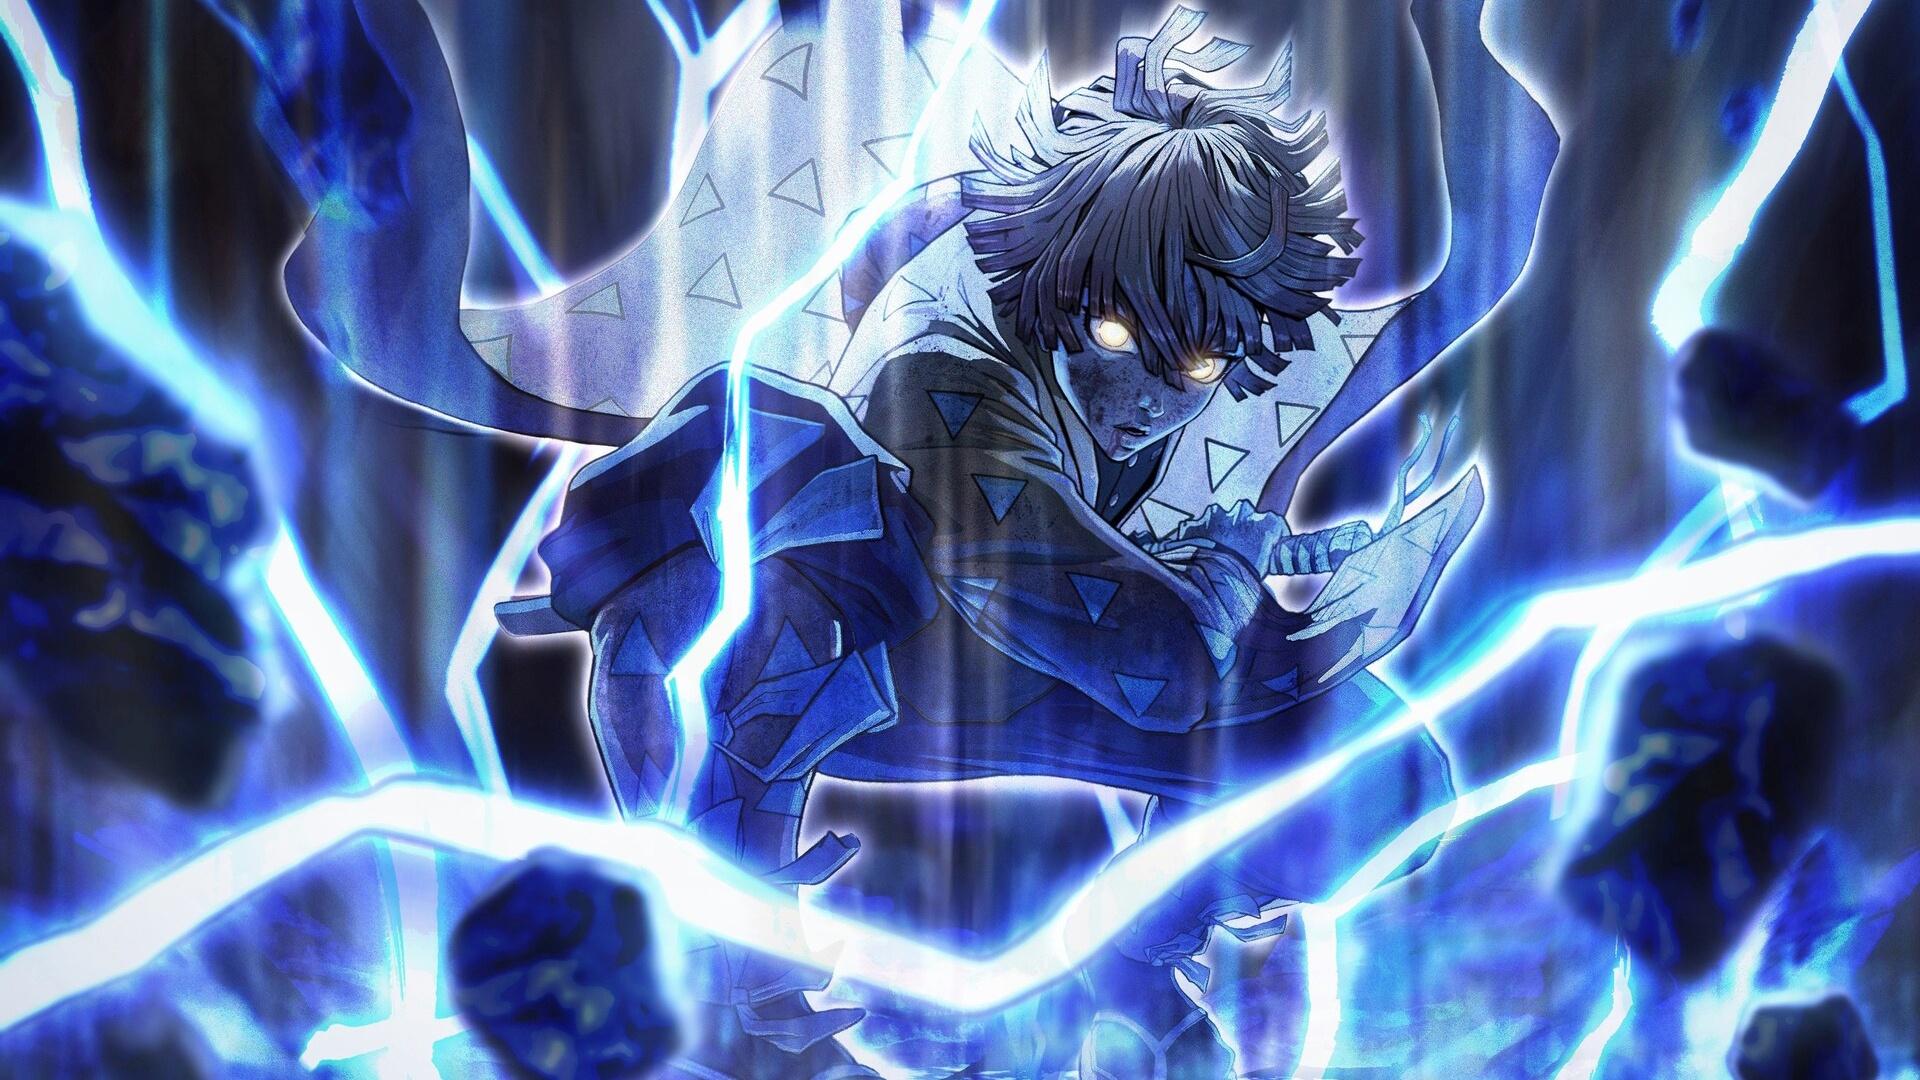 Demon Slayer background picture